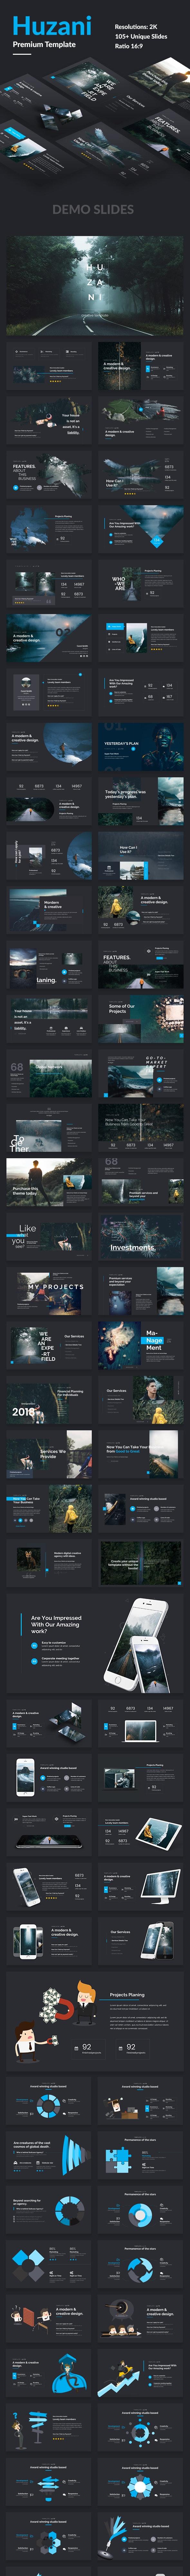 Huzani Premium Design Keynote Template - Creative Keynote Templates